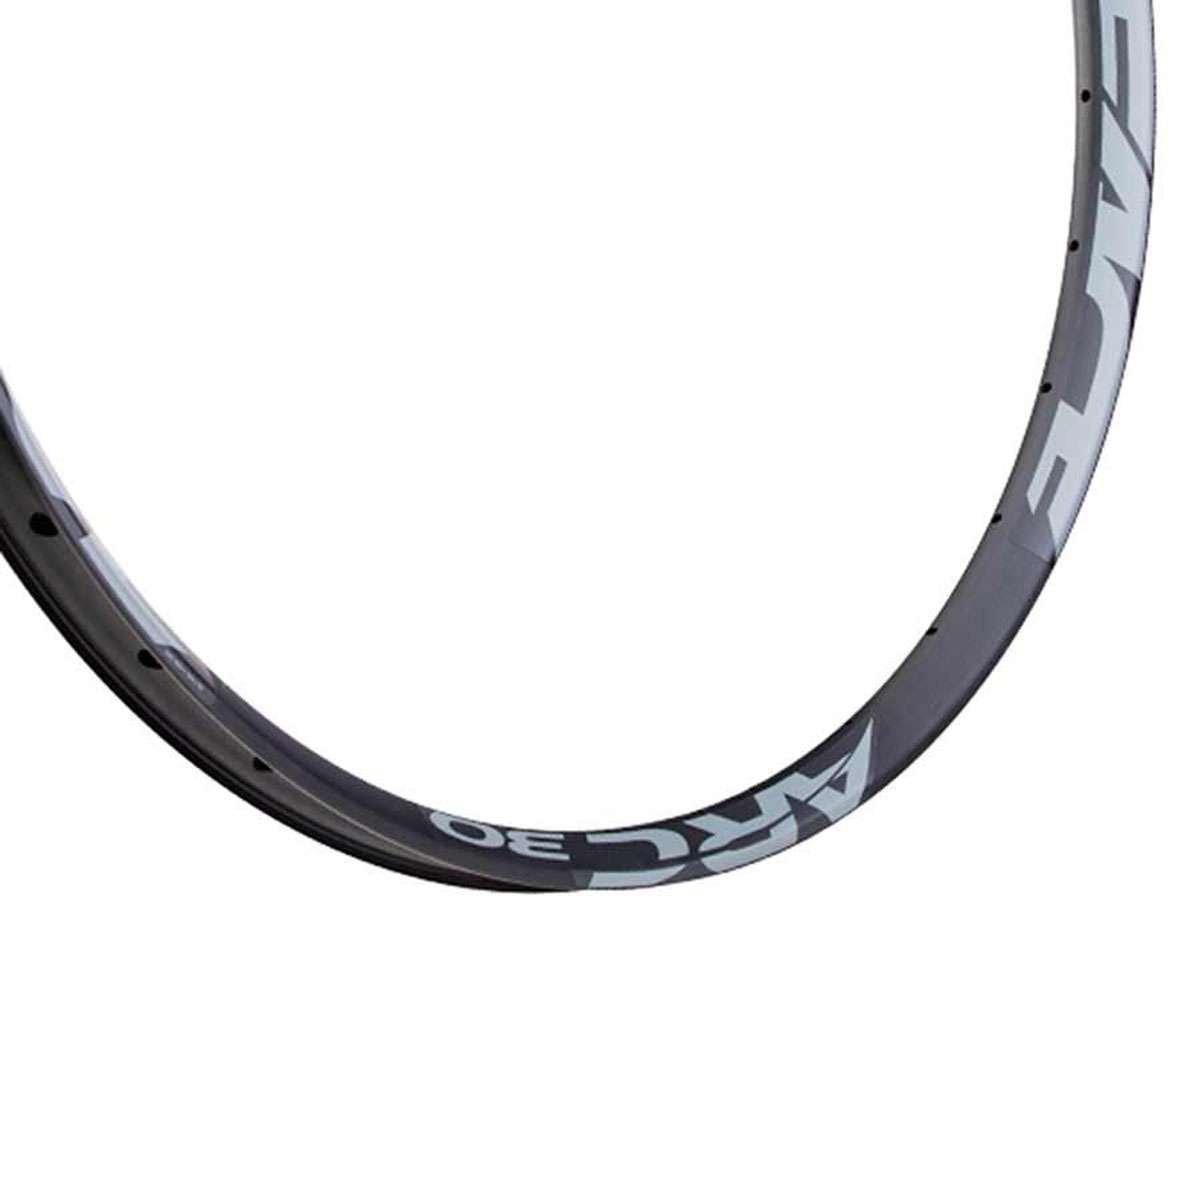 Race Face MTB-Felge Arc Grau, 29 Zoll x 35 mm